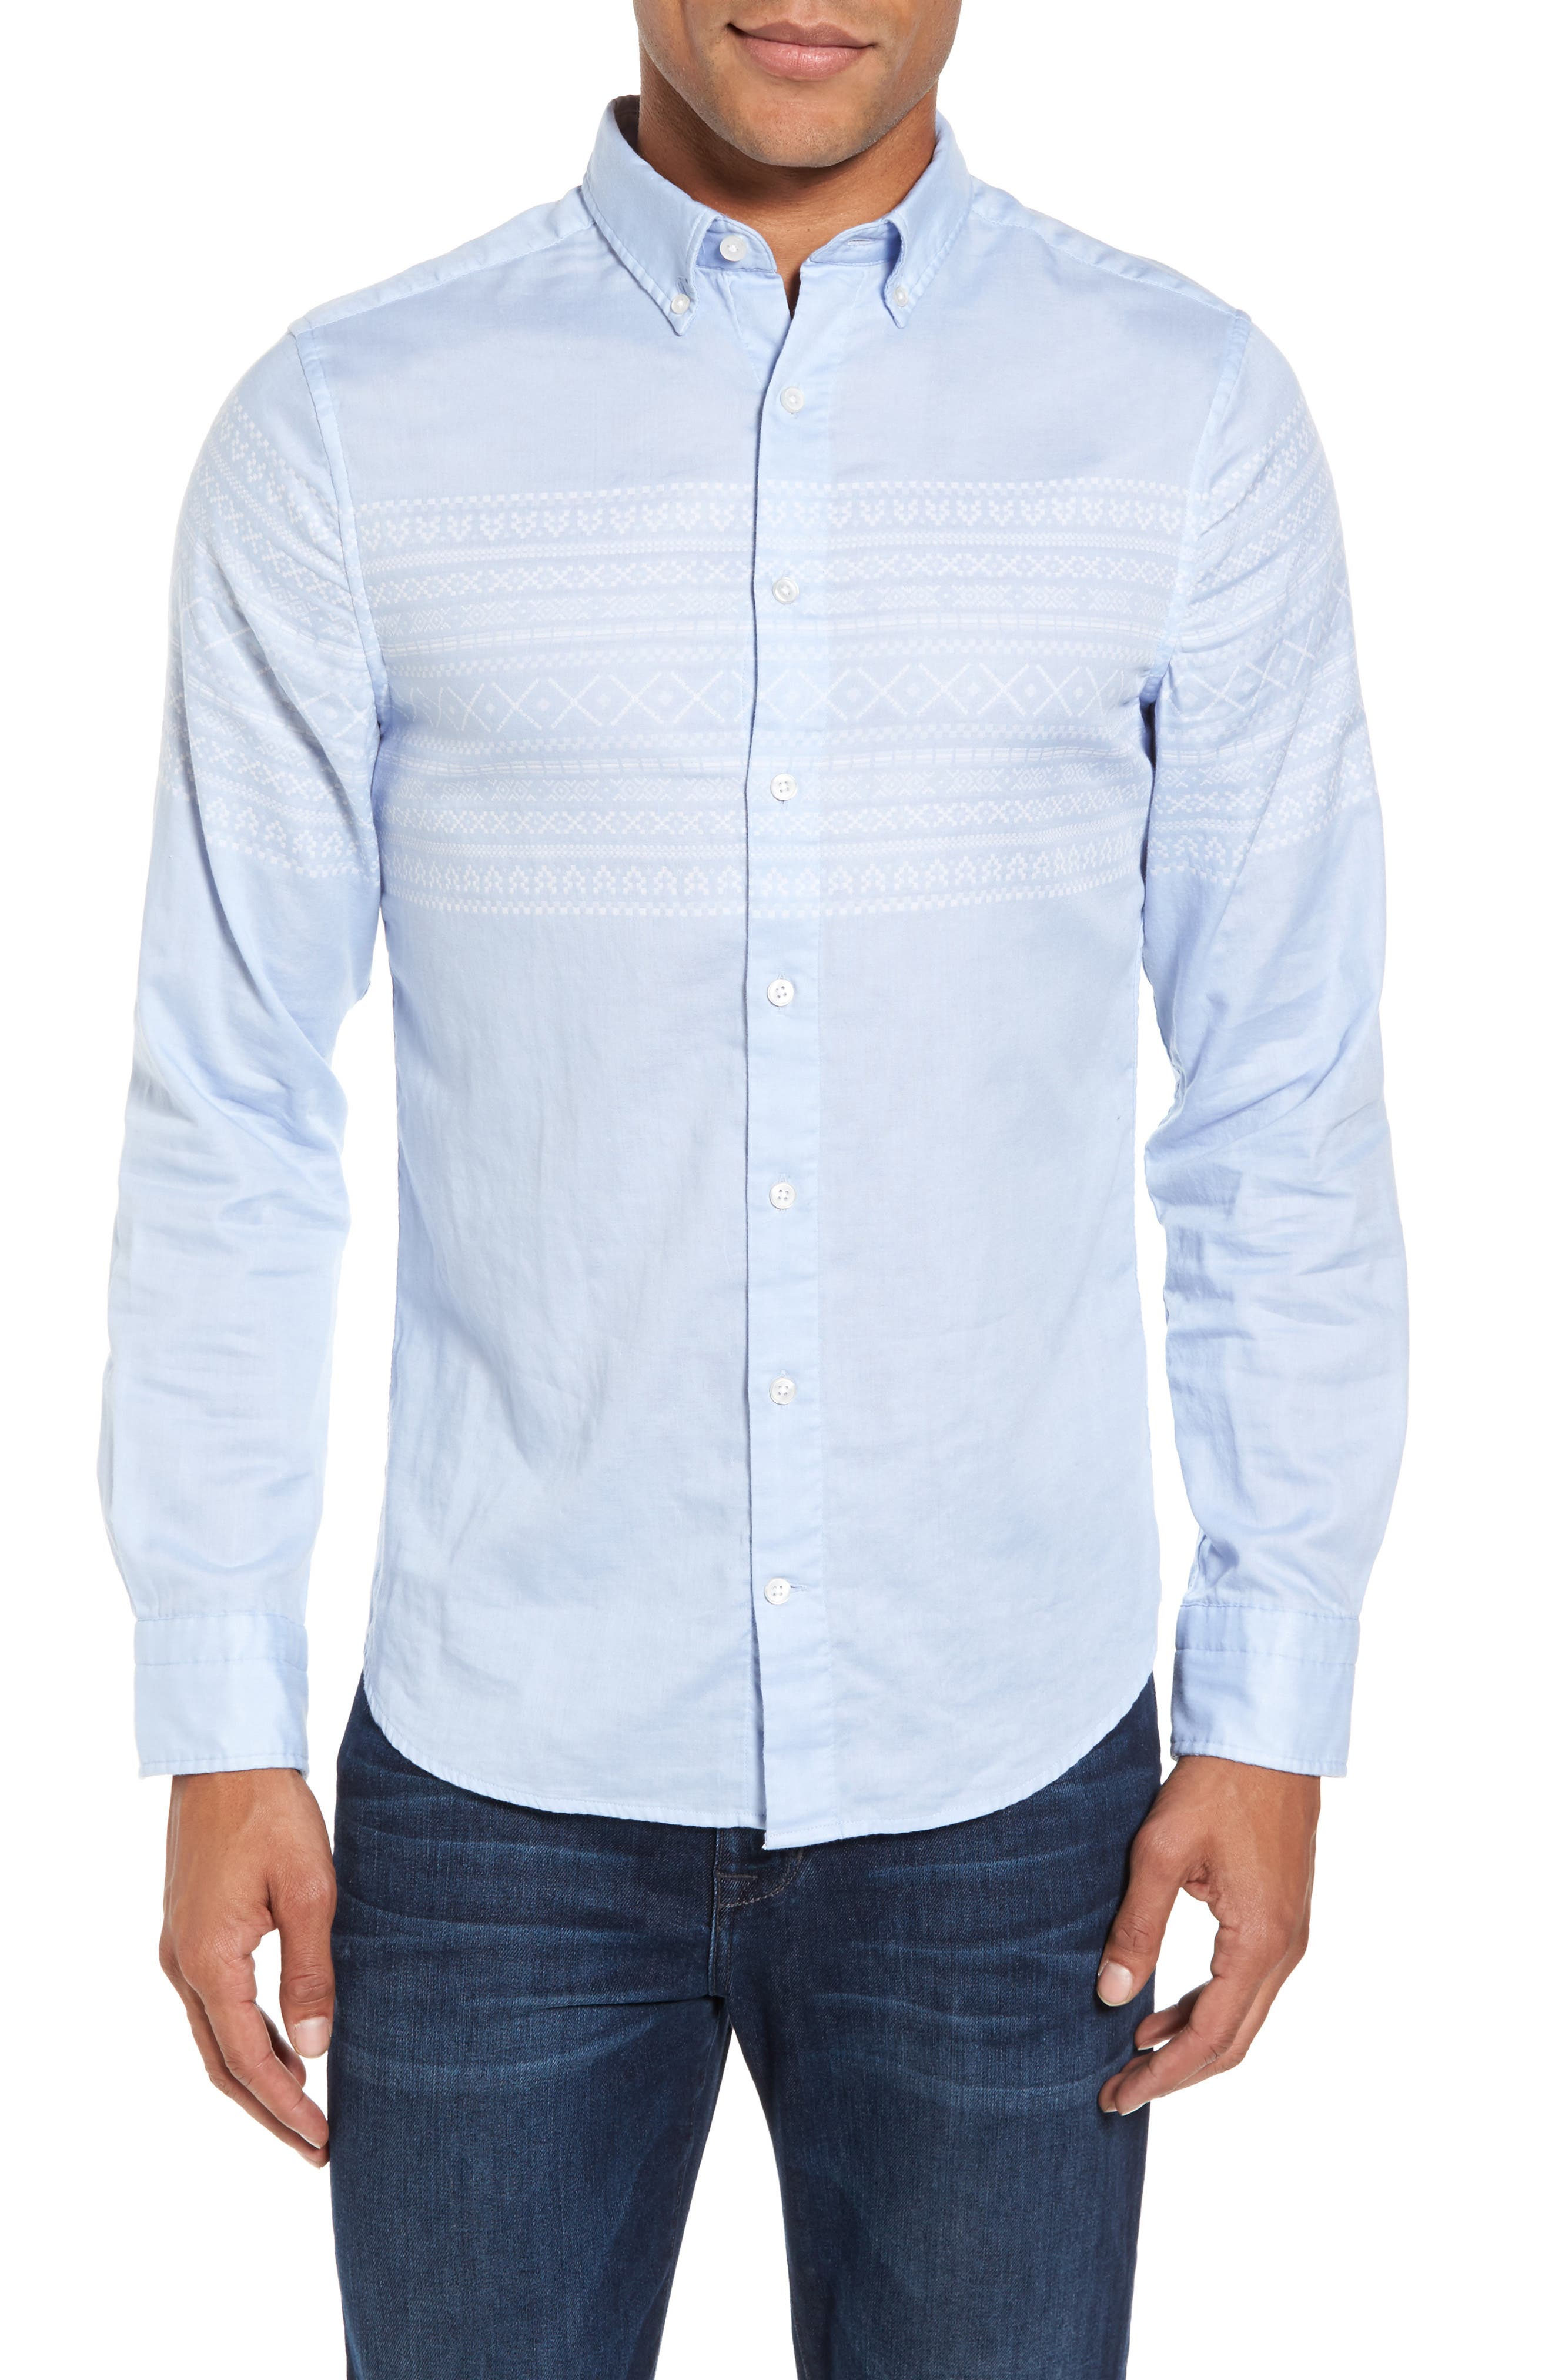 02 Extra Slim Fit Fair Isle Print Sport Shirt,                         Main,                         color, Hamptons Blue